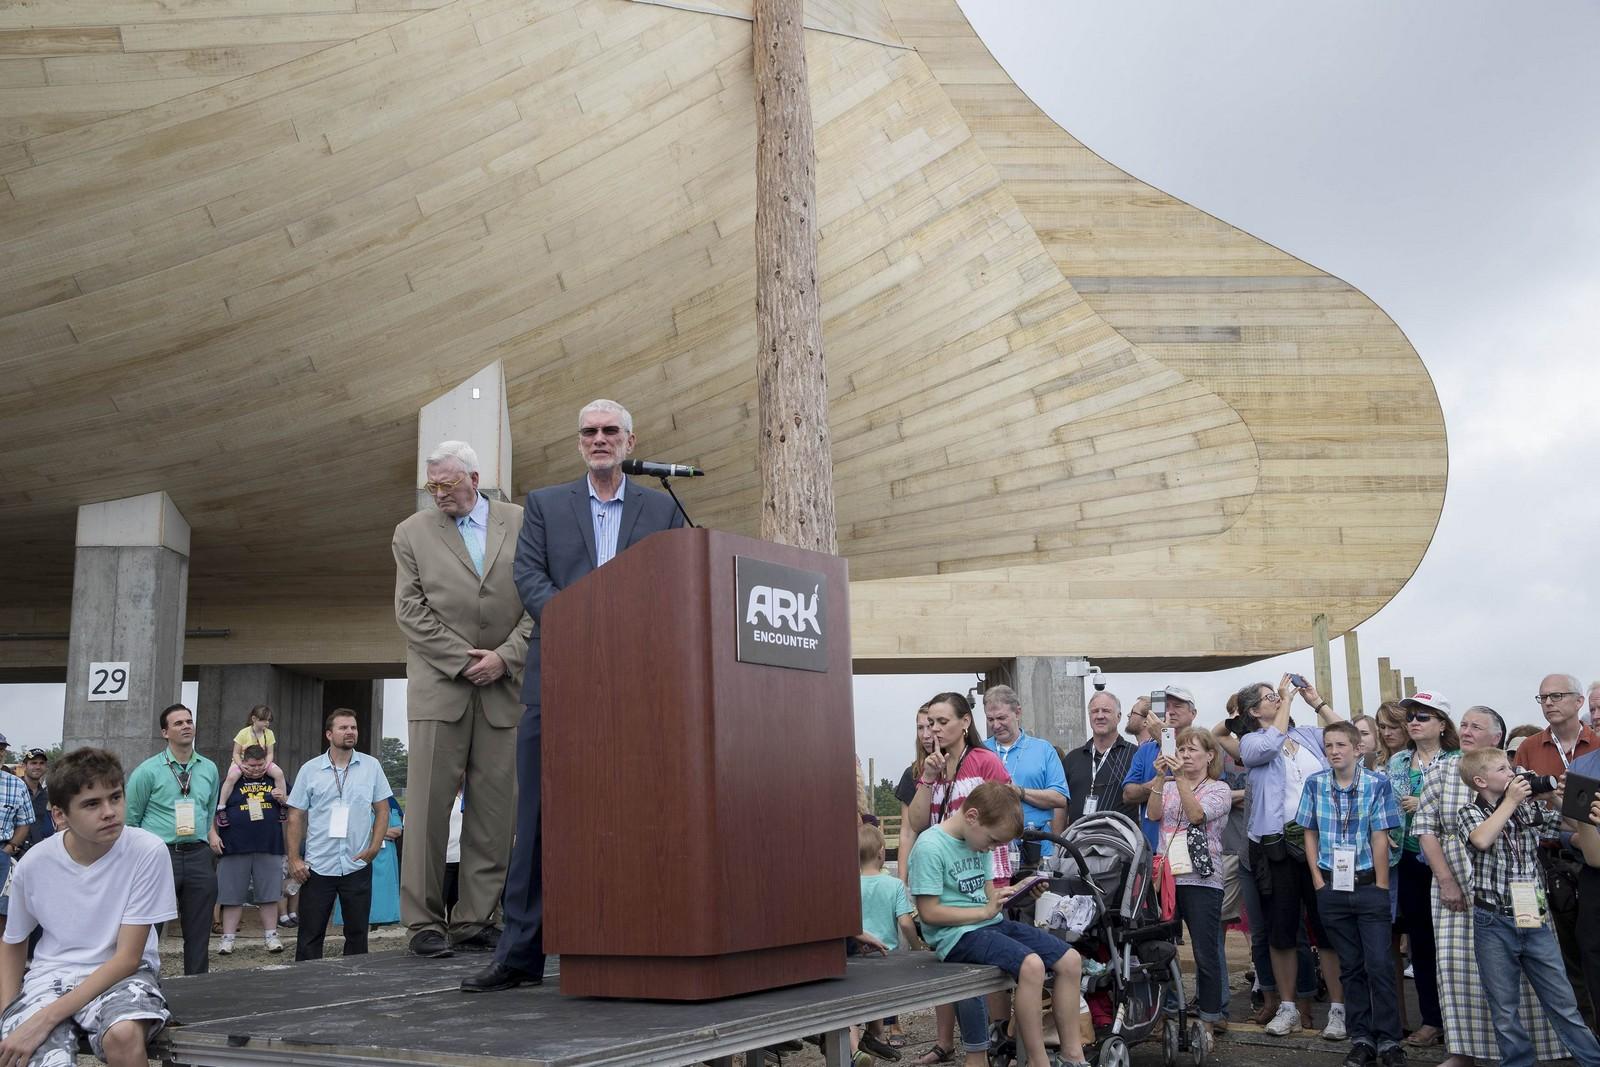 noah u0027s ark replica built to exact dimensions in bible opens amidst